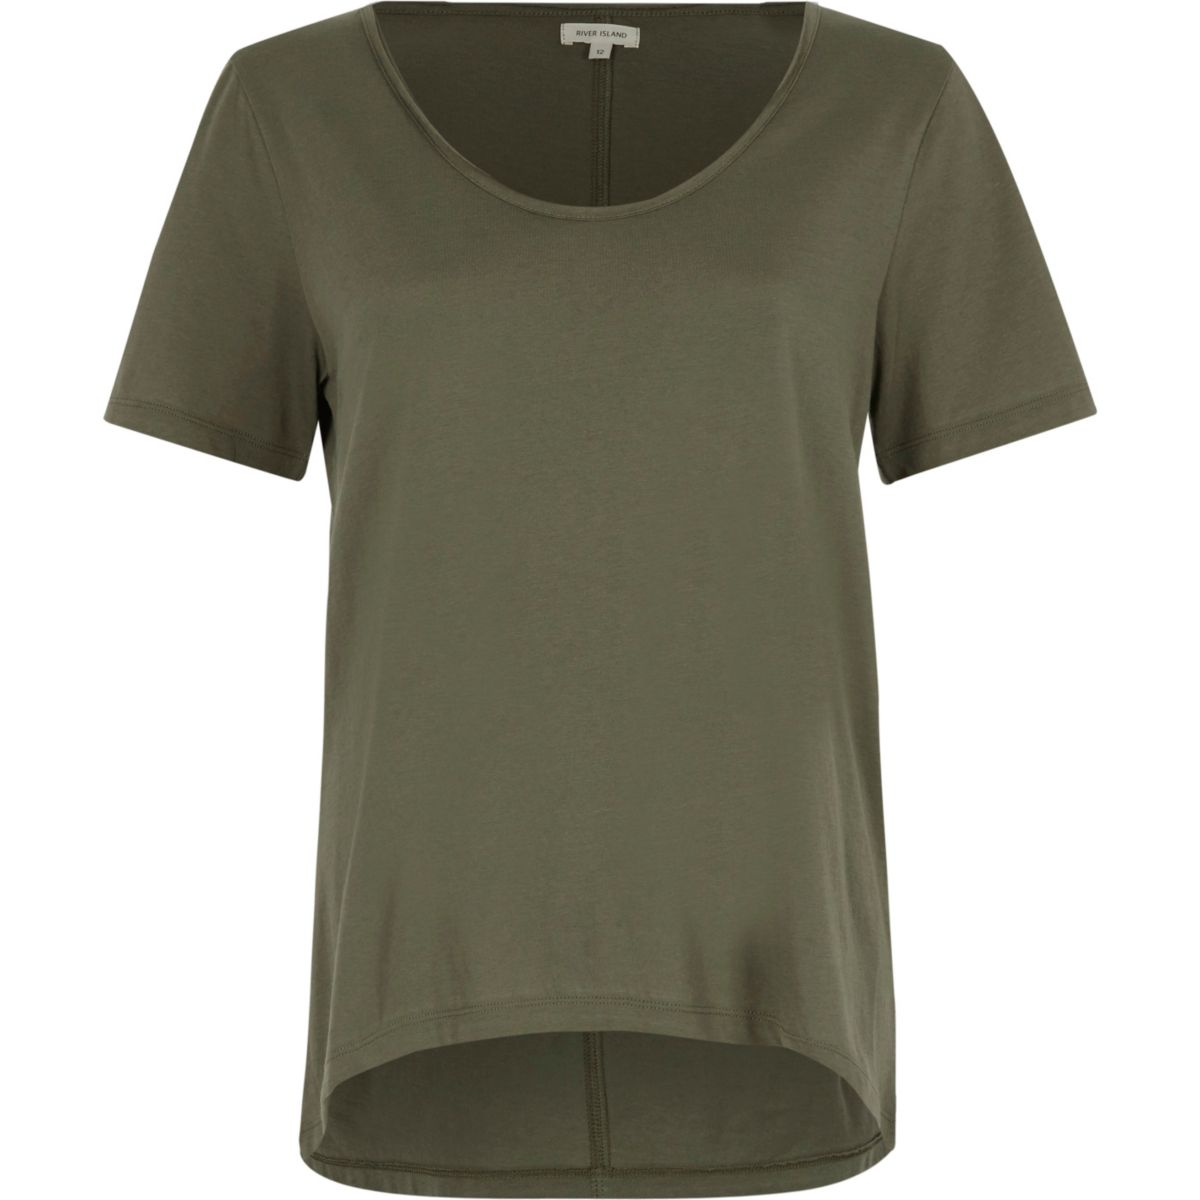 Khaki green scoop neck T-shirt